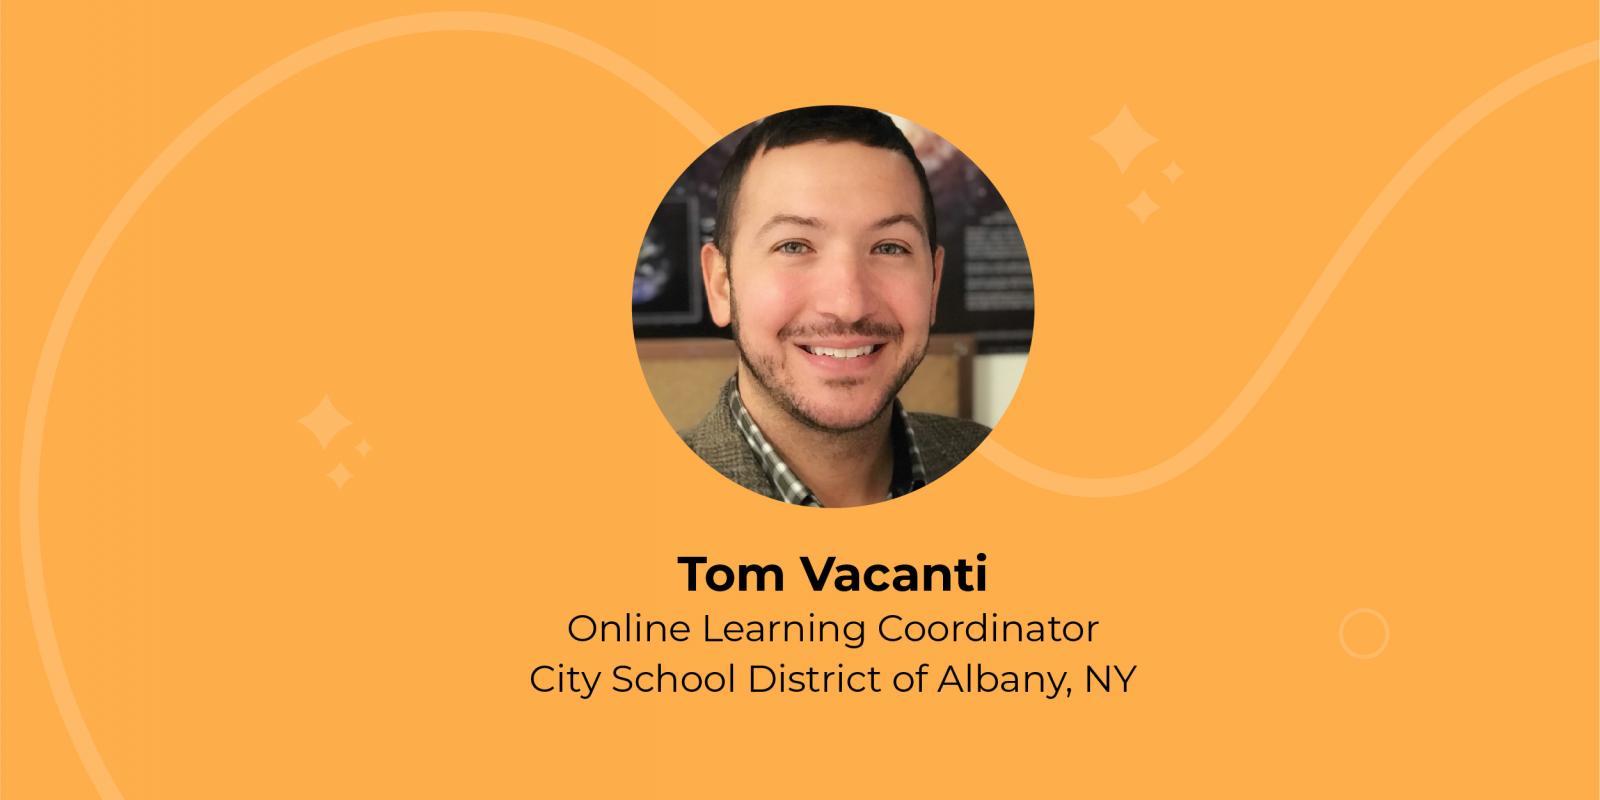 Tom Vacanti